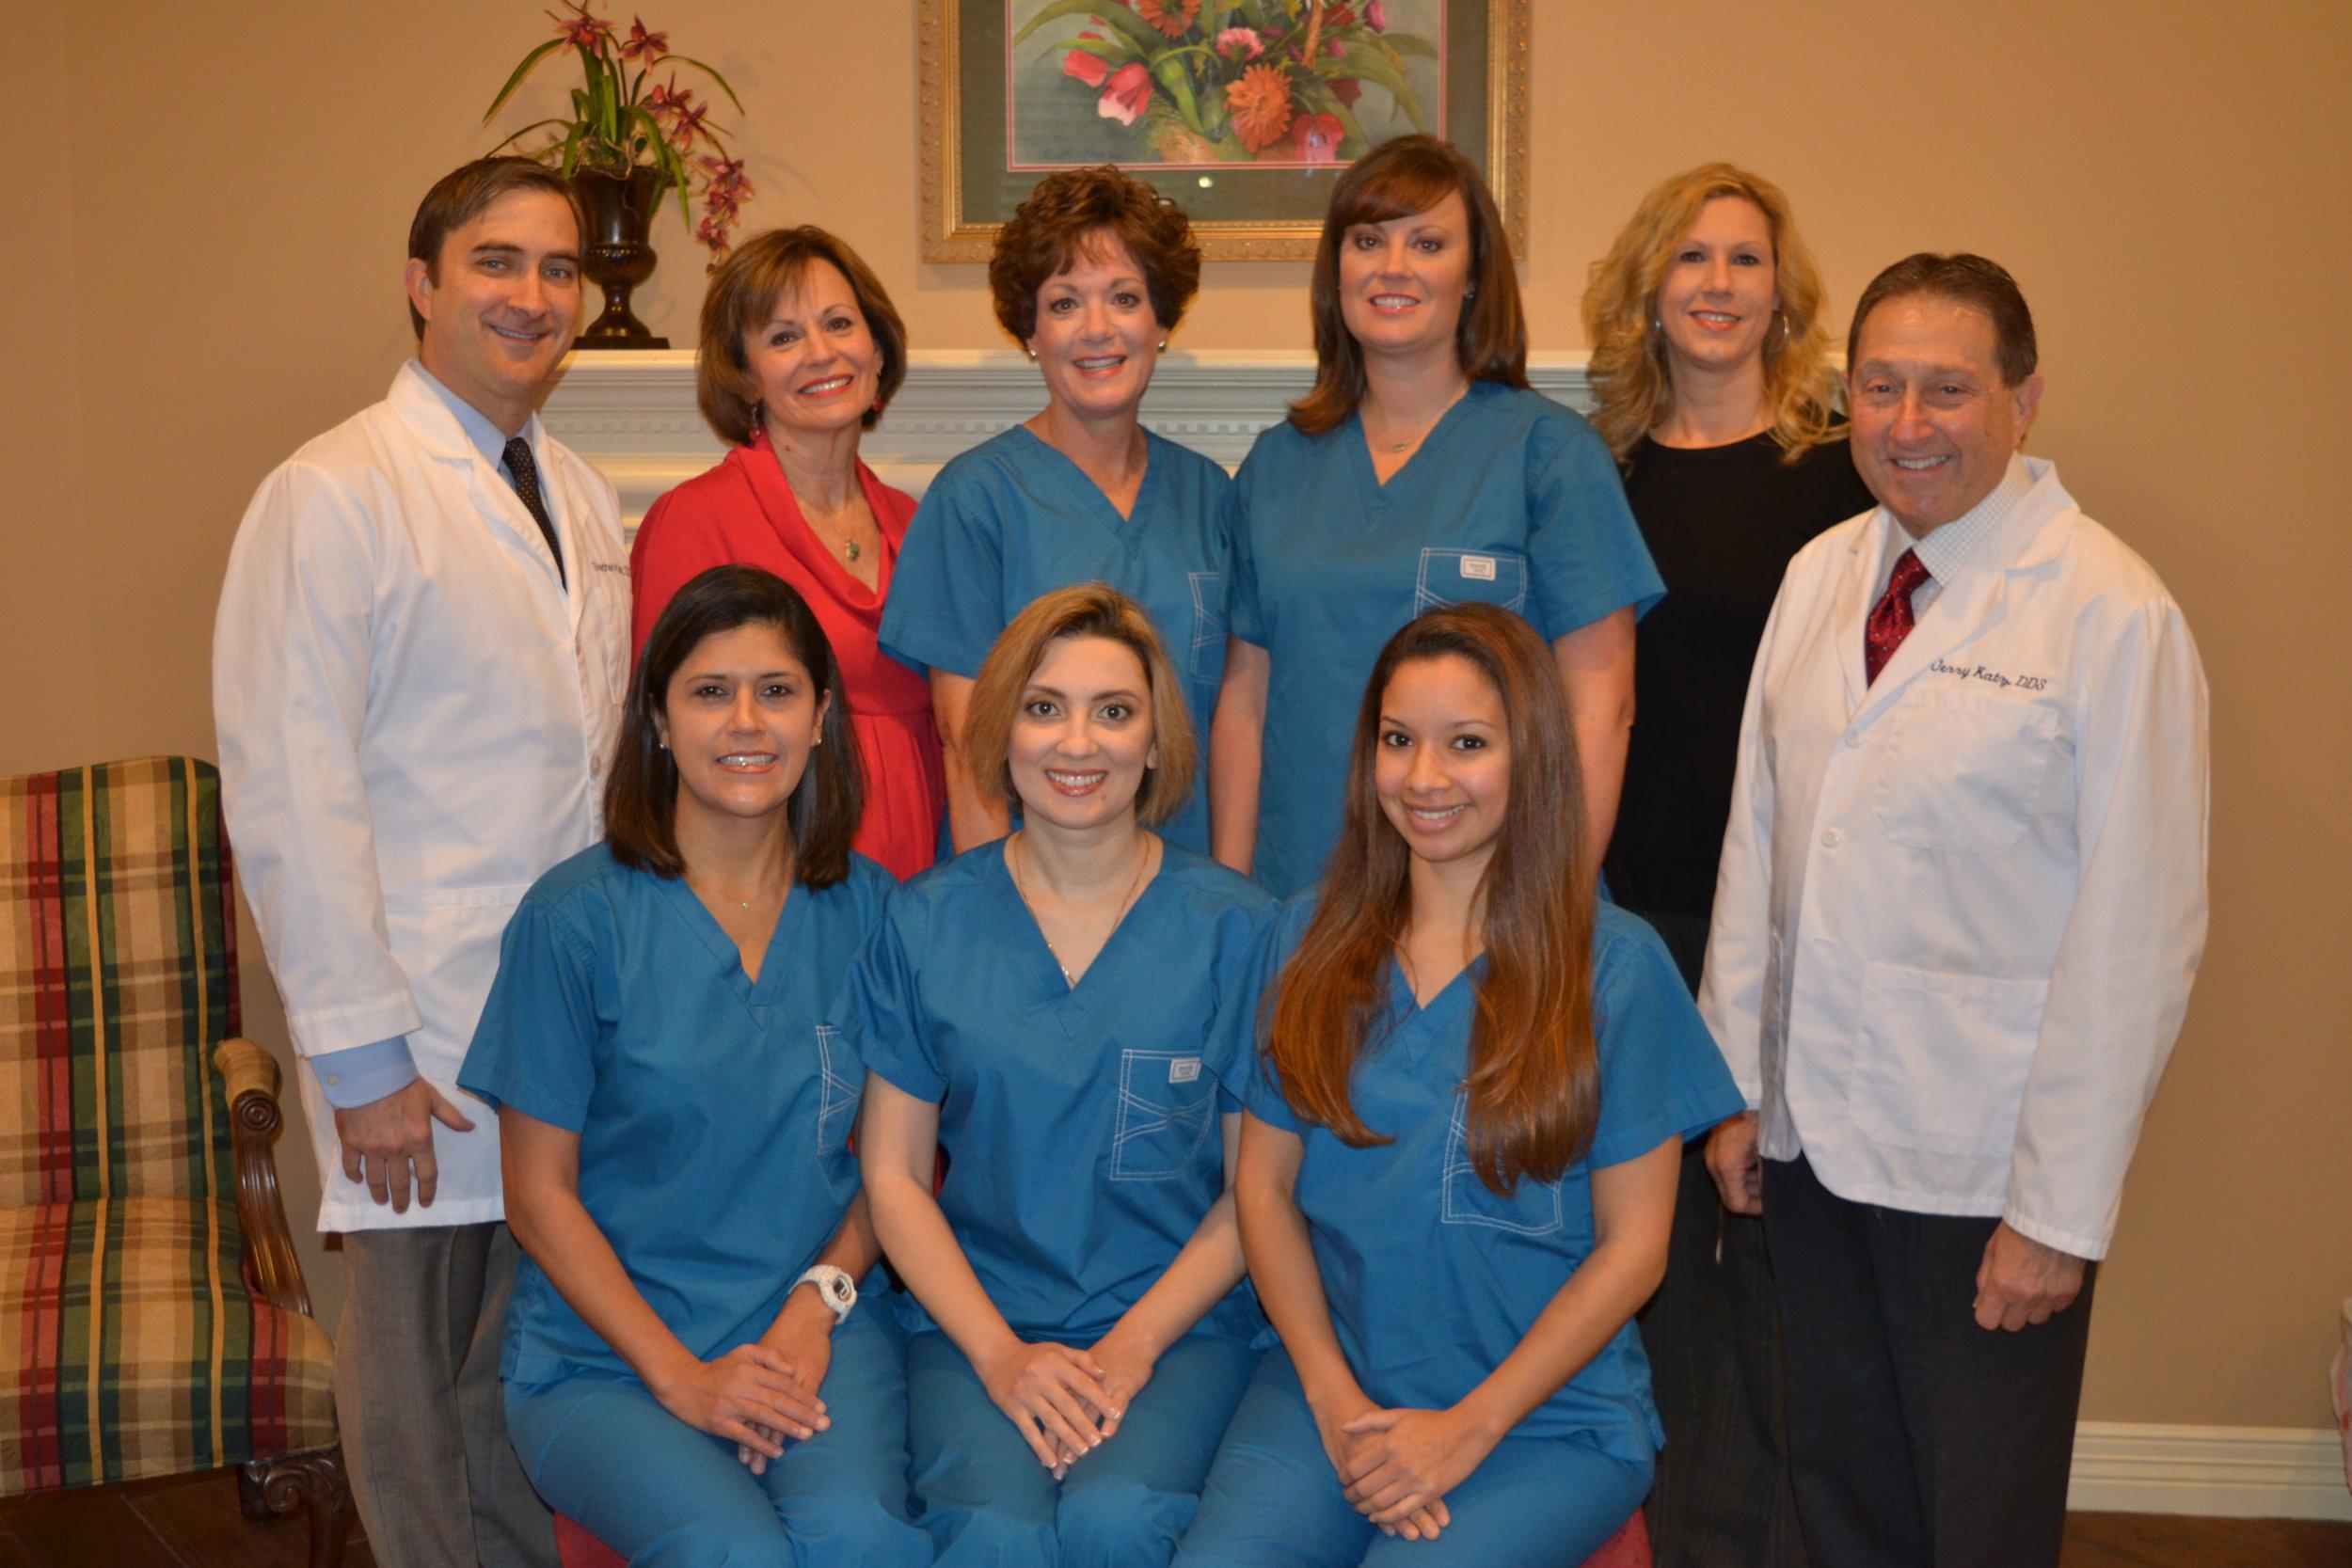 Katz dentistry, best dentist in central Texas